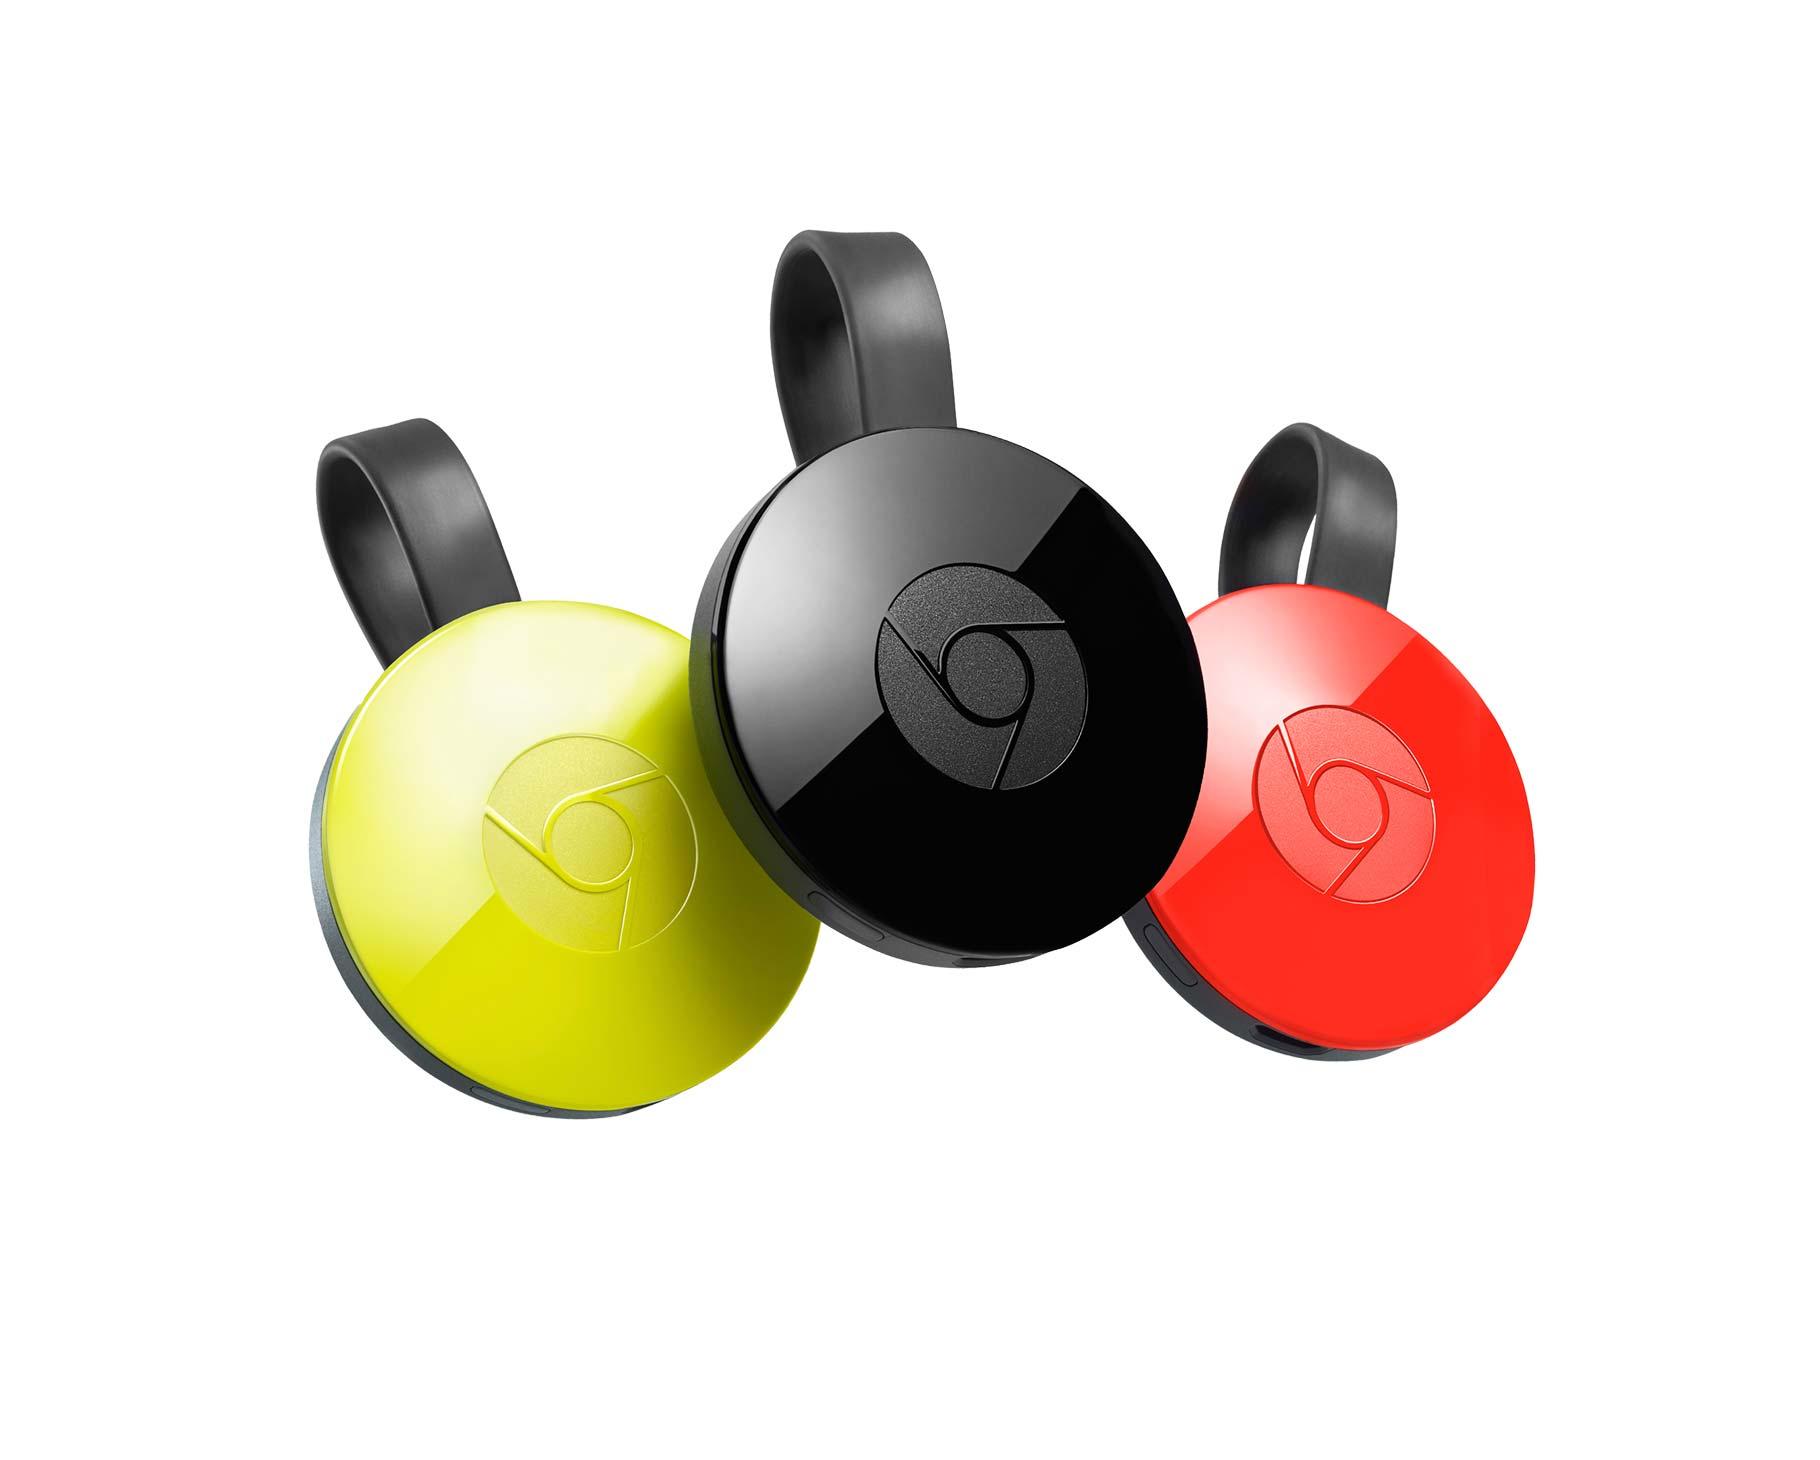 Chromecast google for Goodl